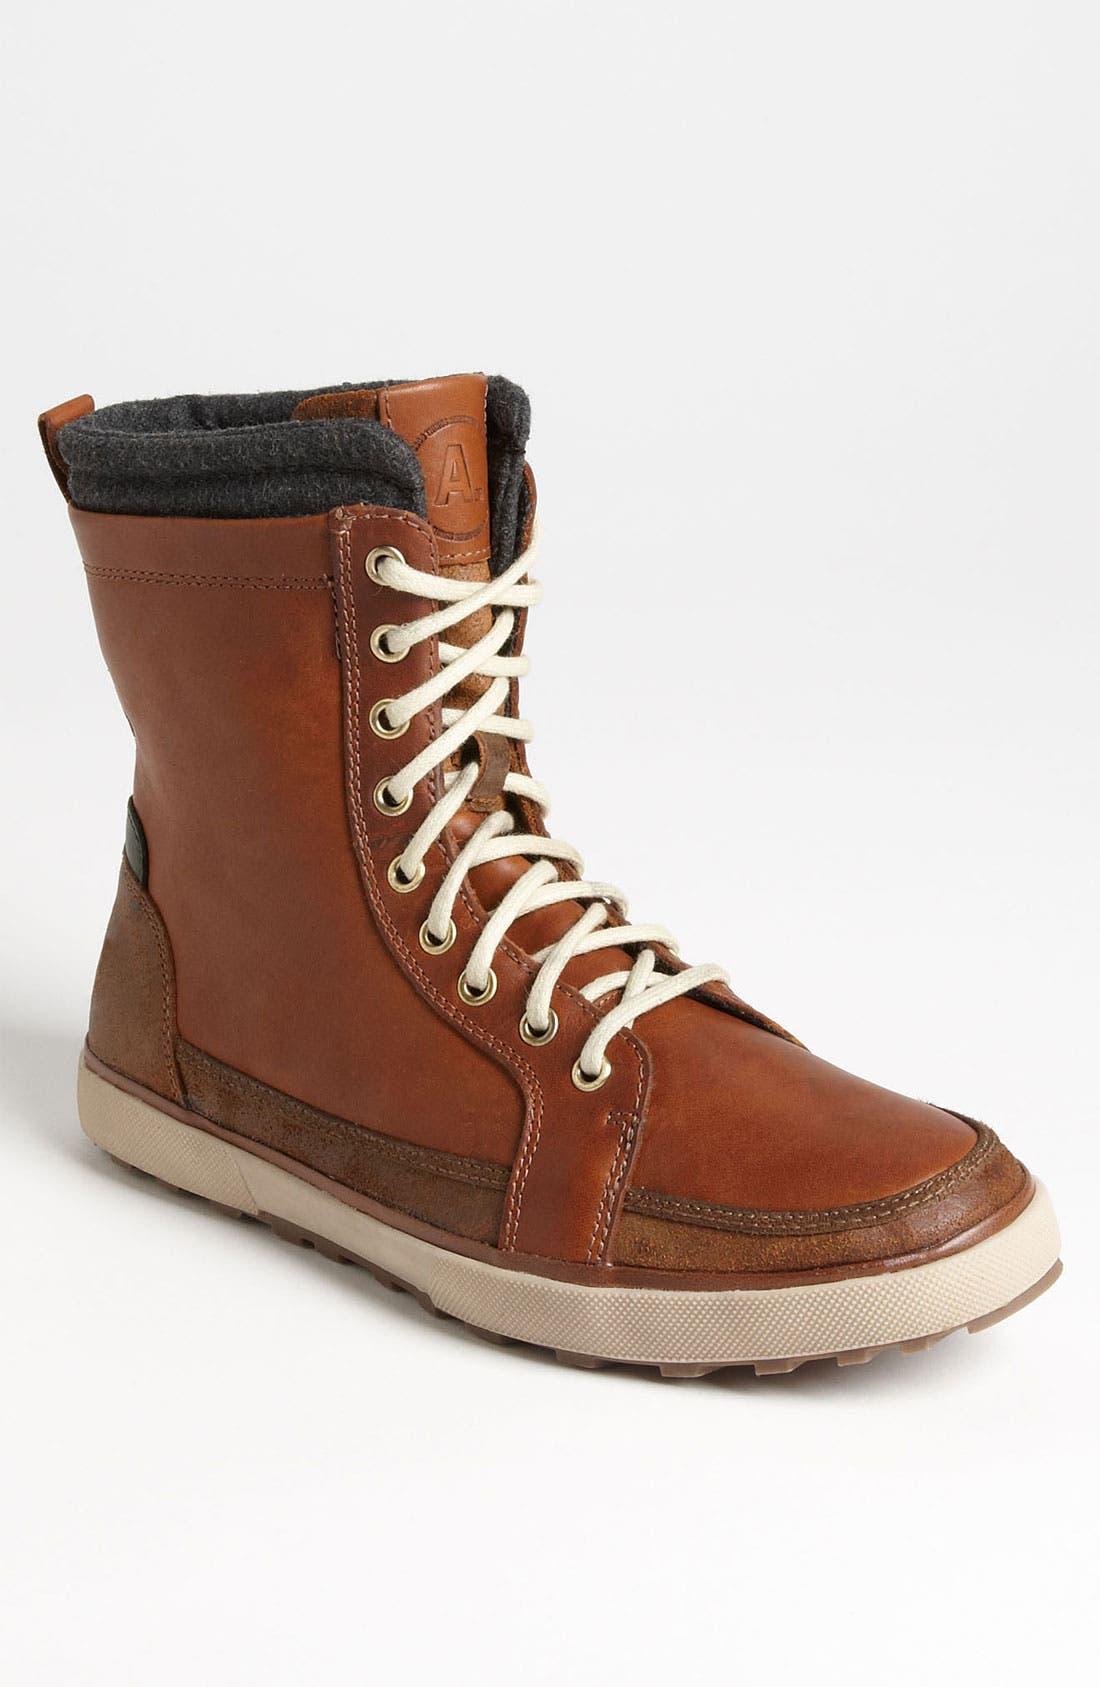 Alternate Image 1 Selected - ALDO 'Grabau' Moc Toe Boot